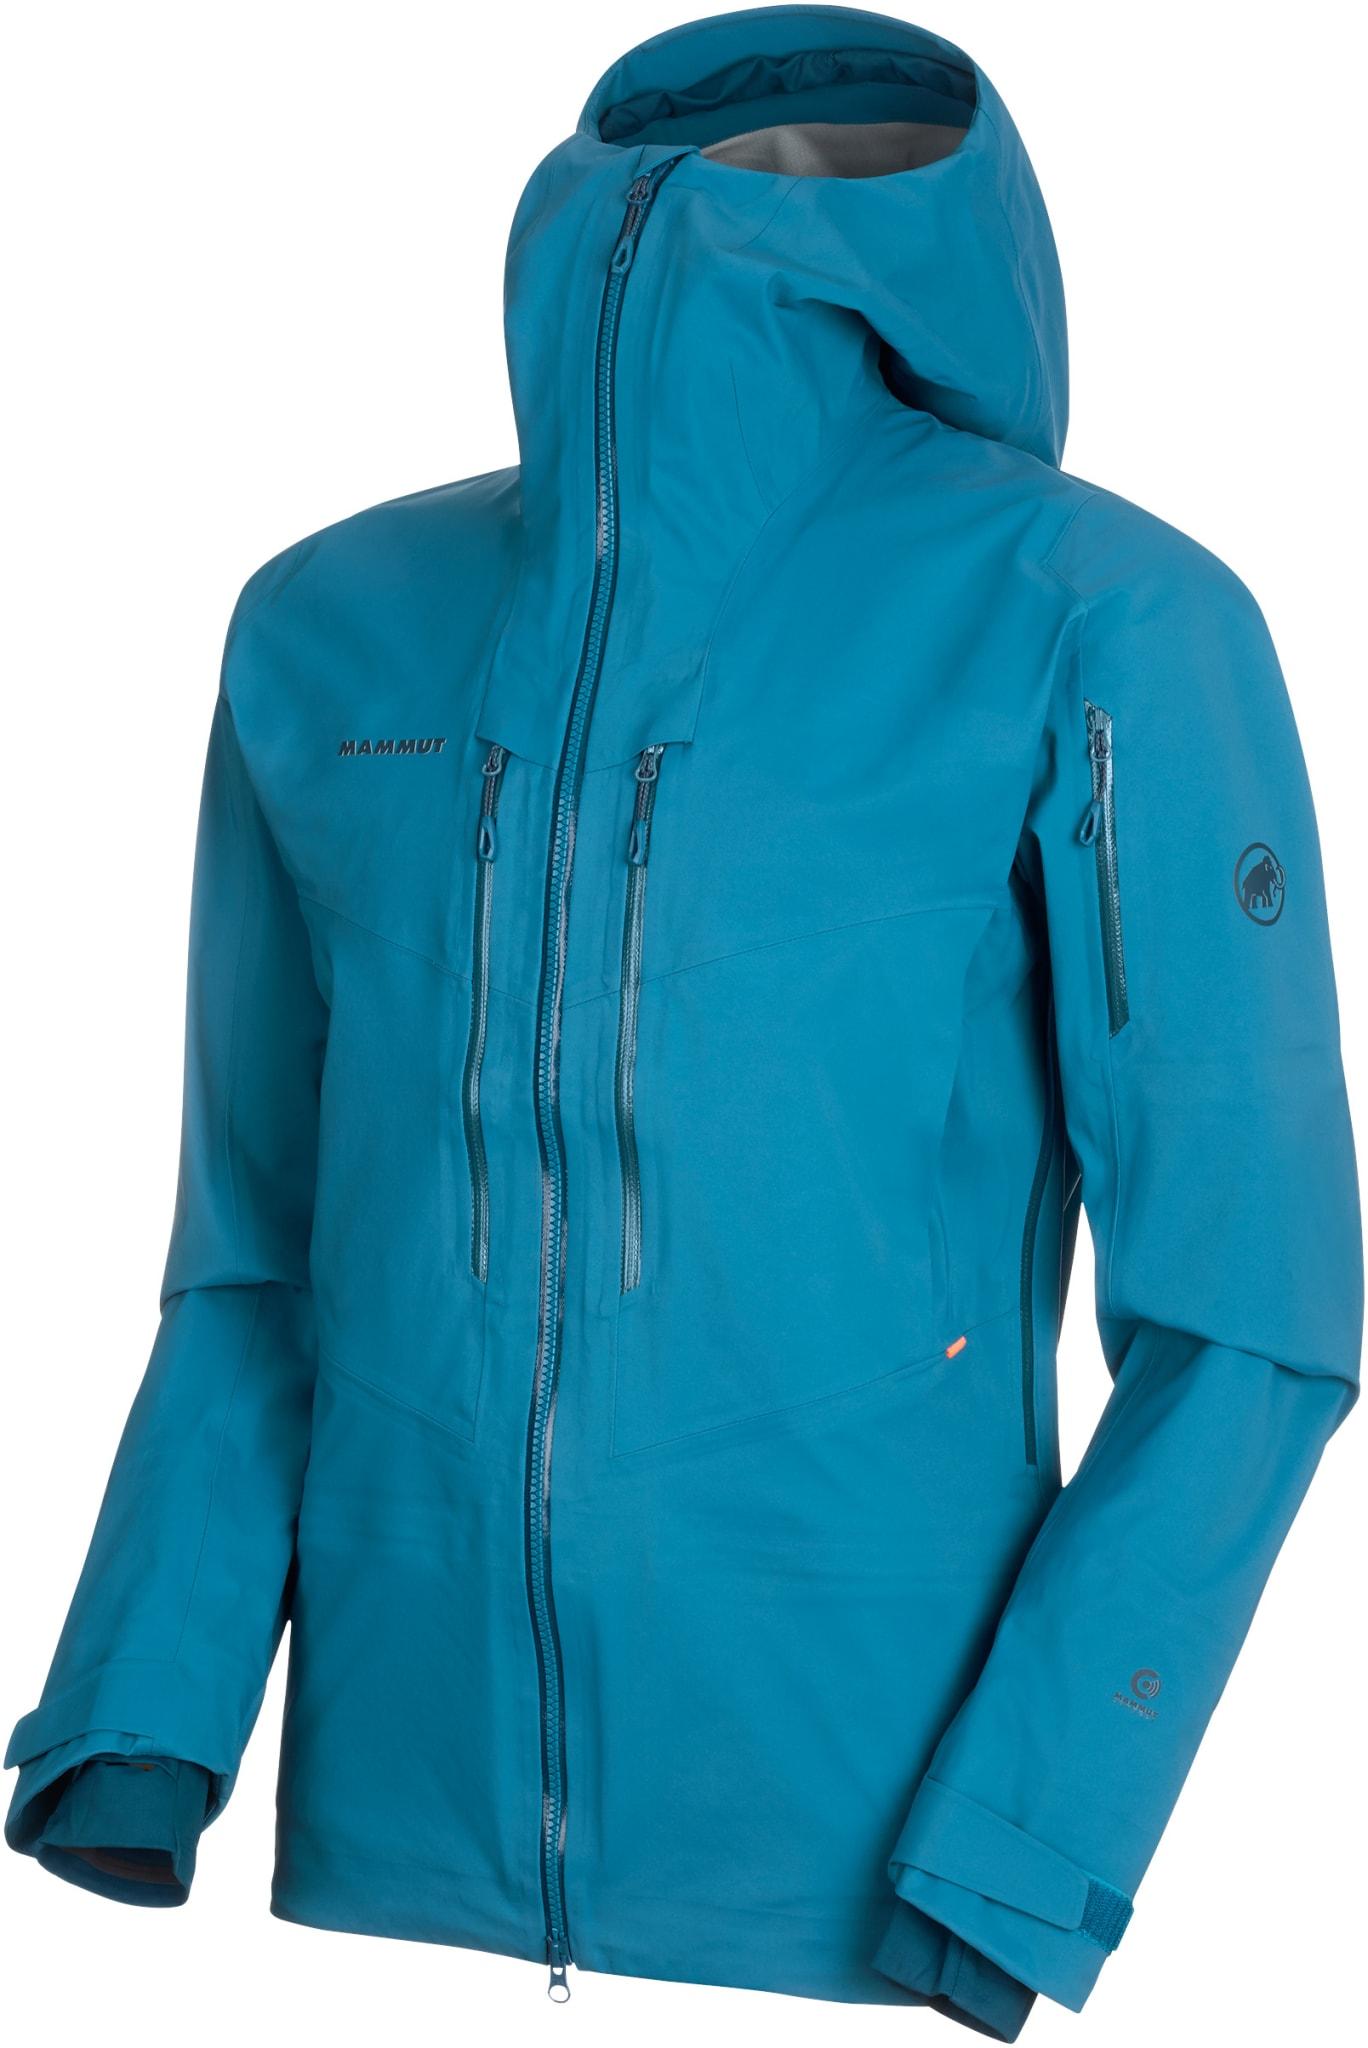 Haldigrat HS Hooded Jacket M